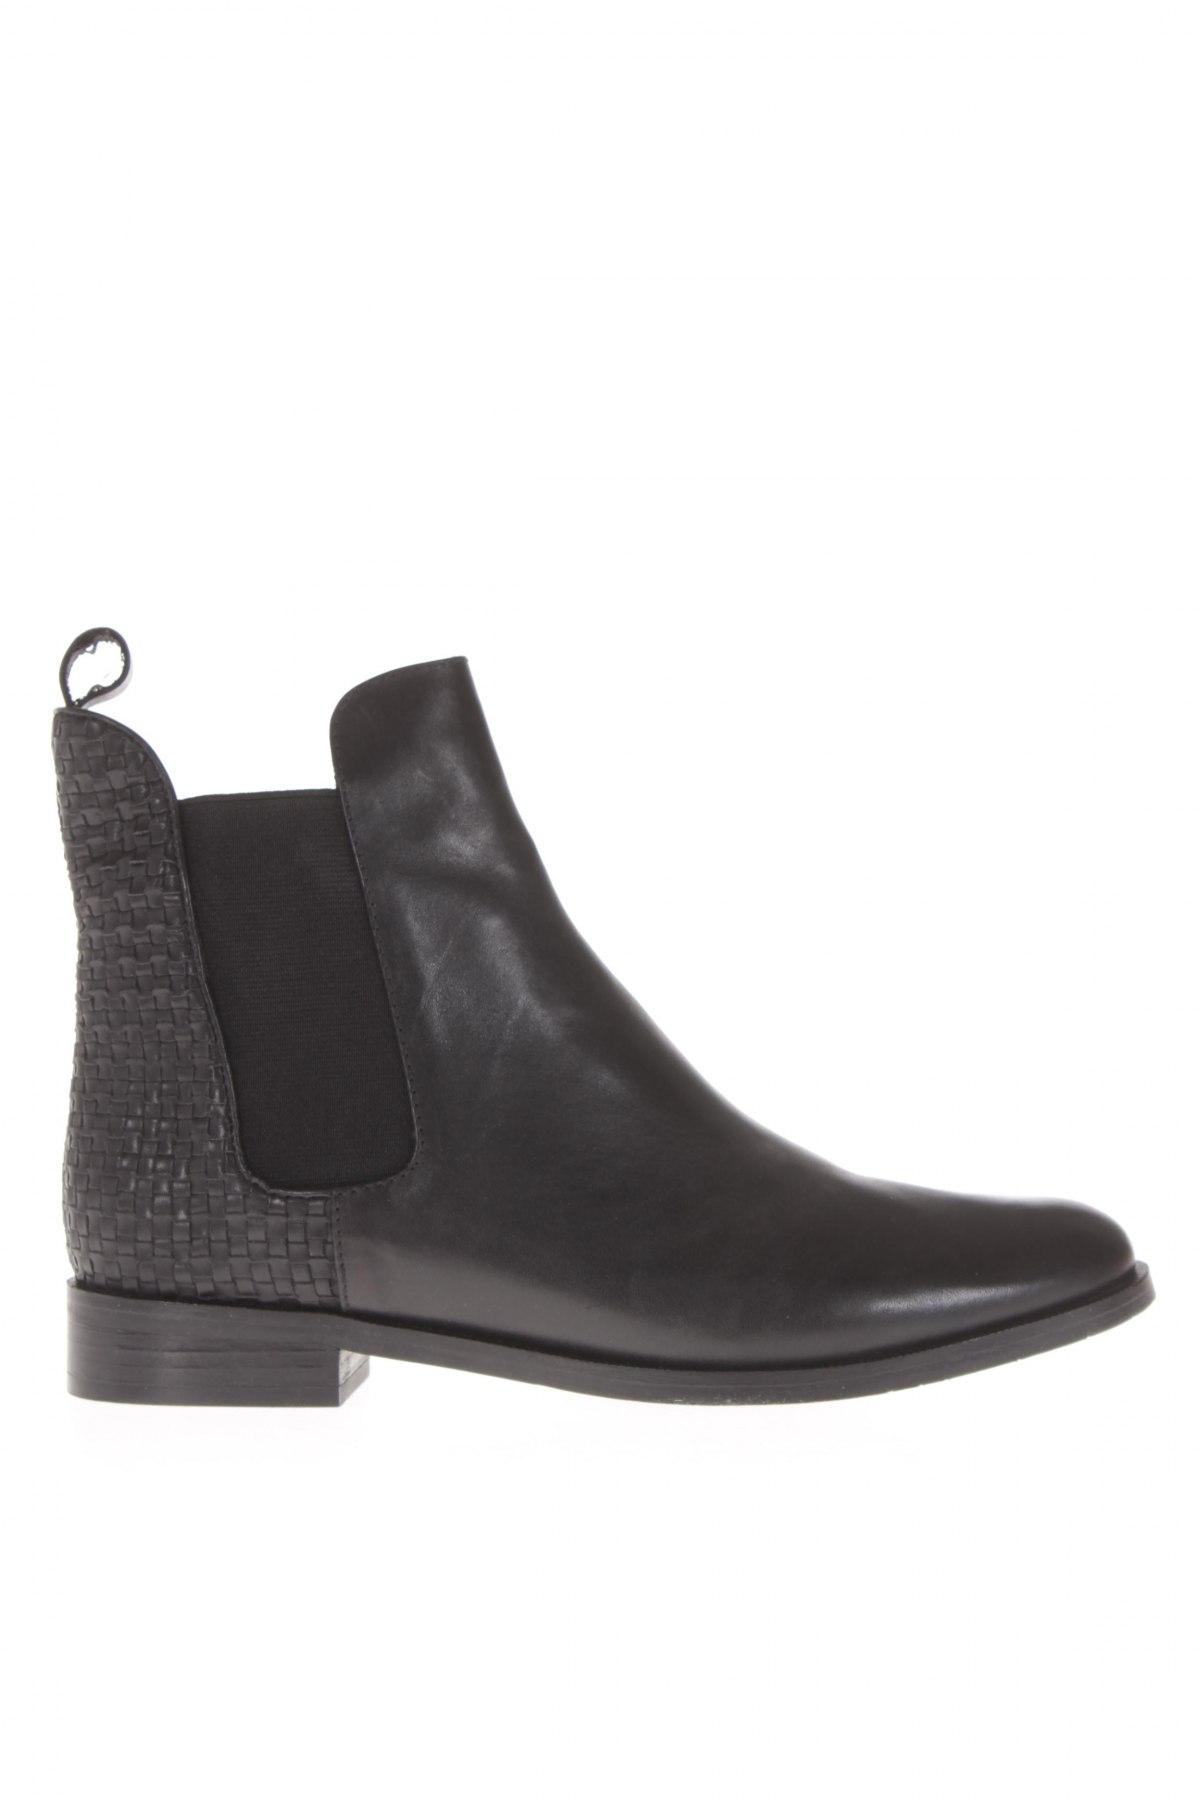 women 39 s ankle boots kiomi 7807873 remix. Black Bedroom Furniture Sets. Home Design Ideas